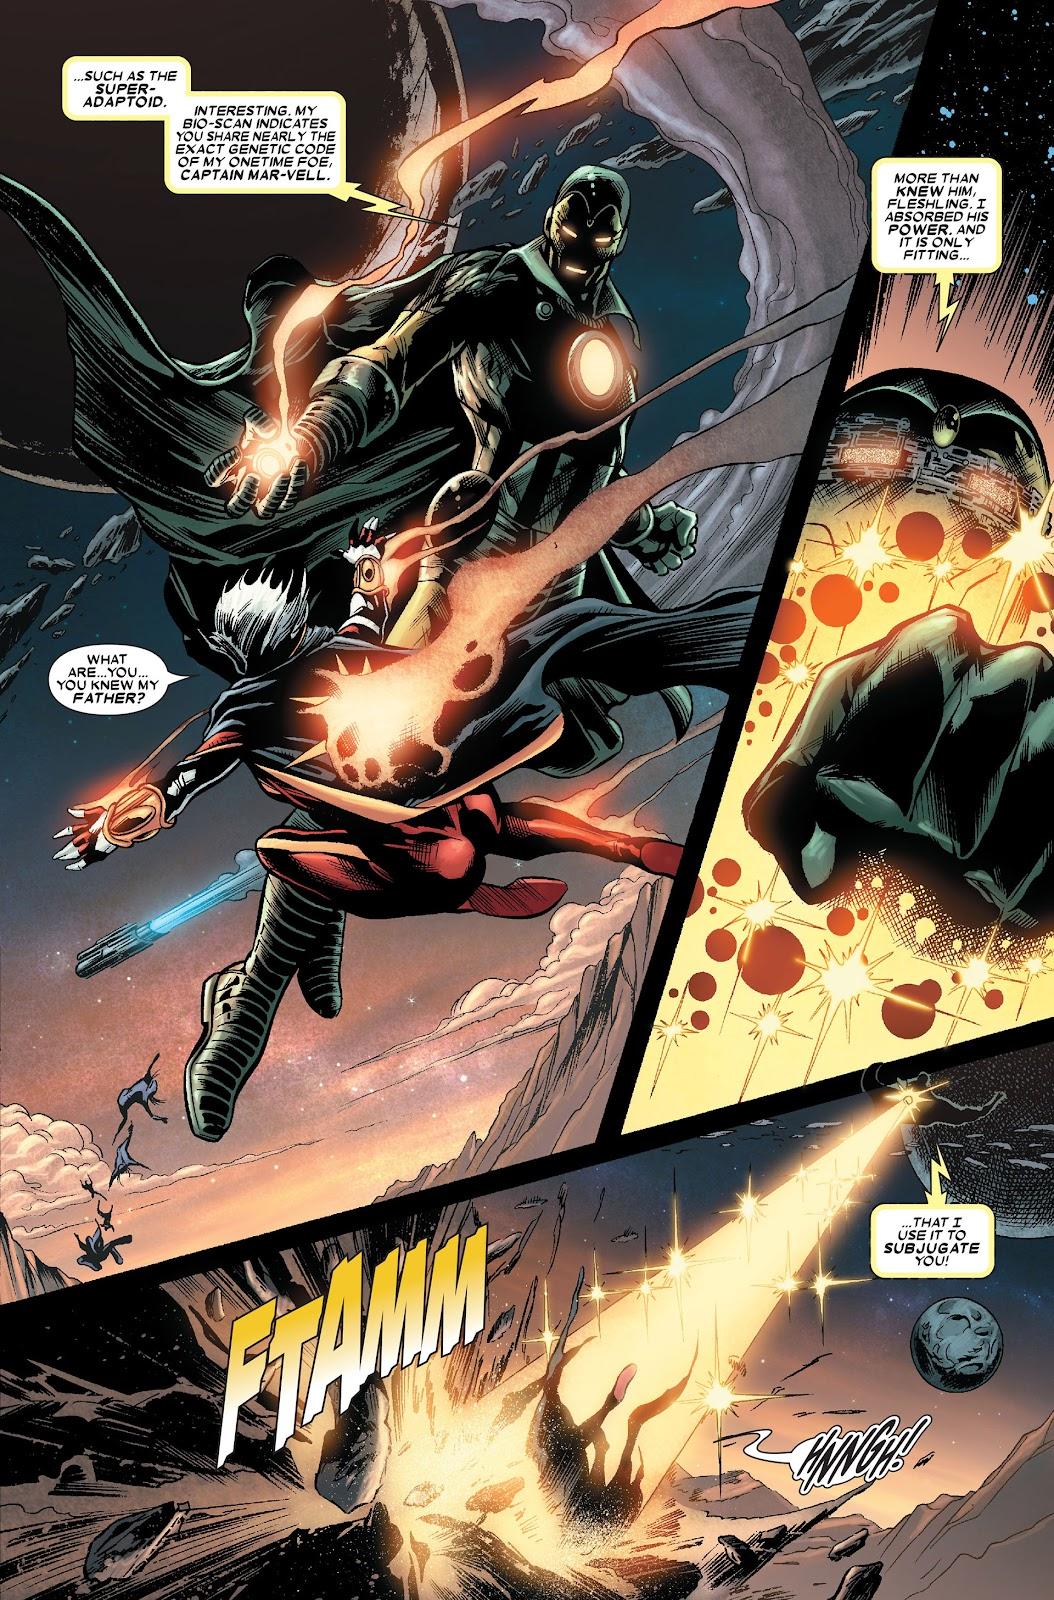 Annihilation: Conquest - Quasar issue 1 - Page 7